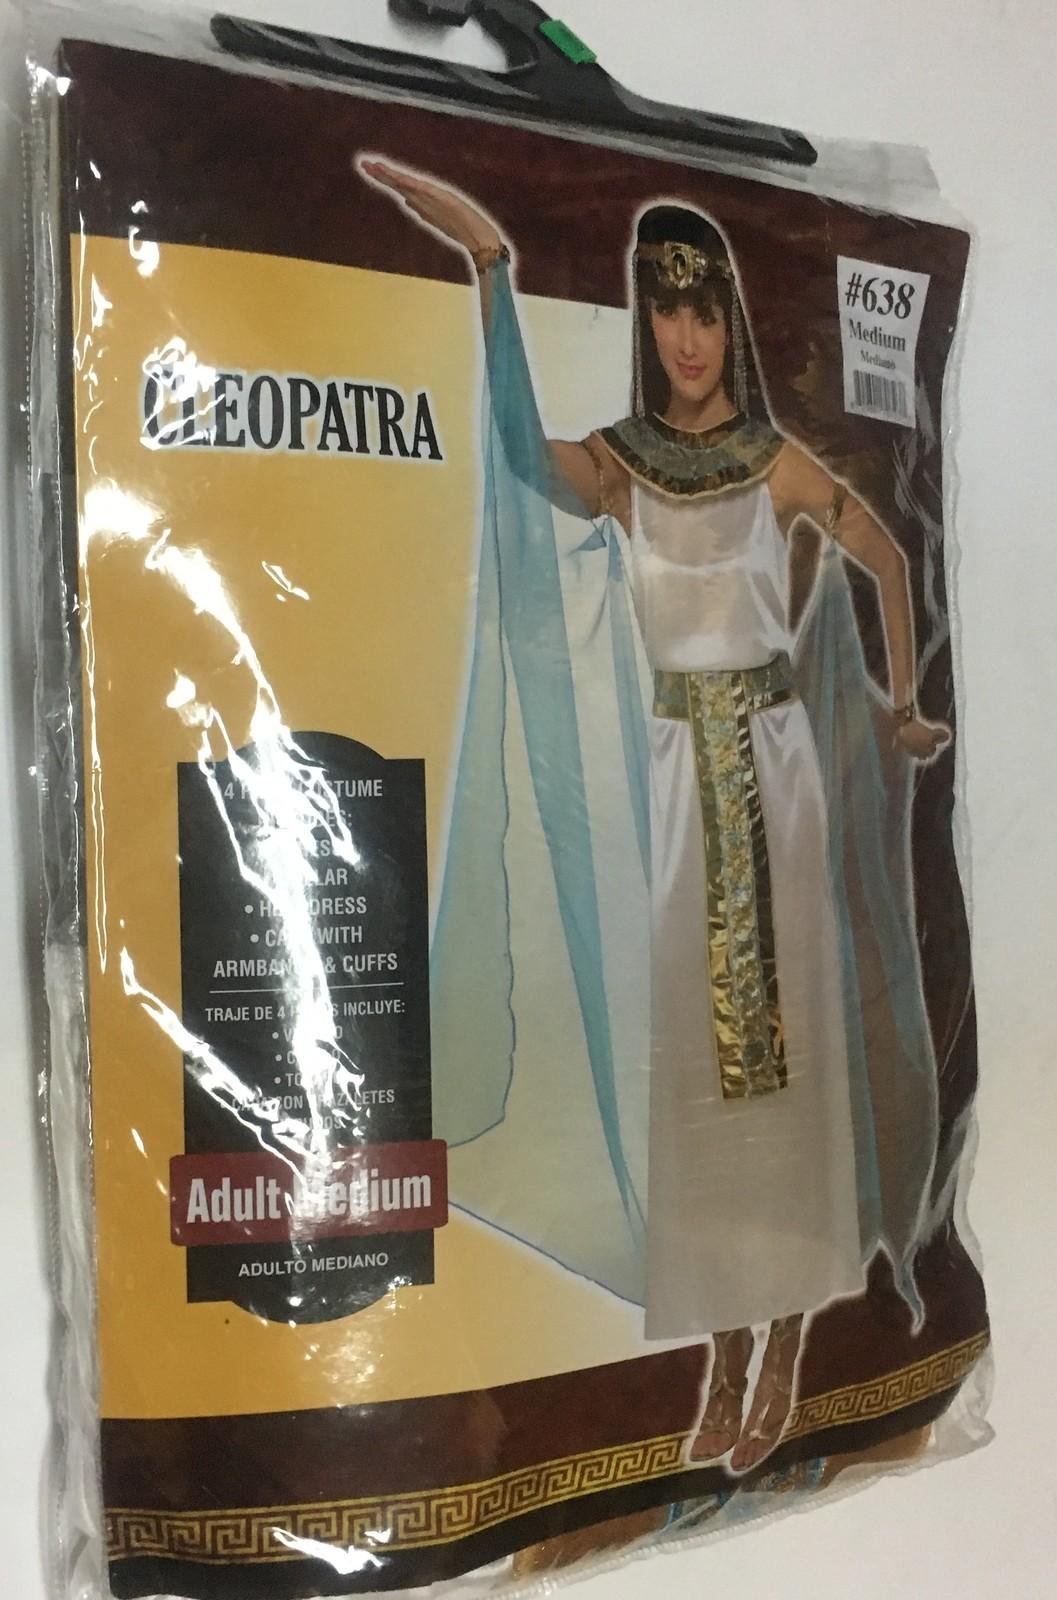 Cleopatra 4 Piece Costume Adult Medium (6-8)